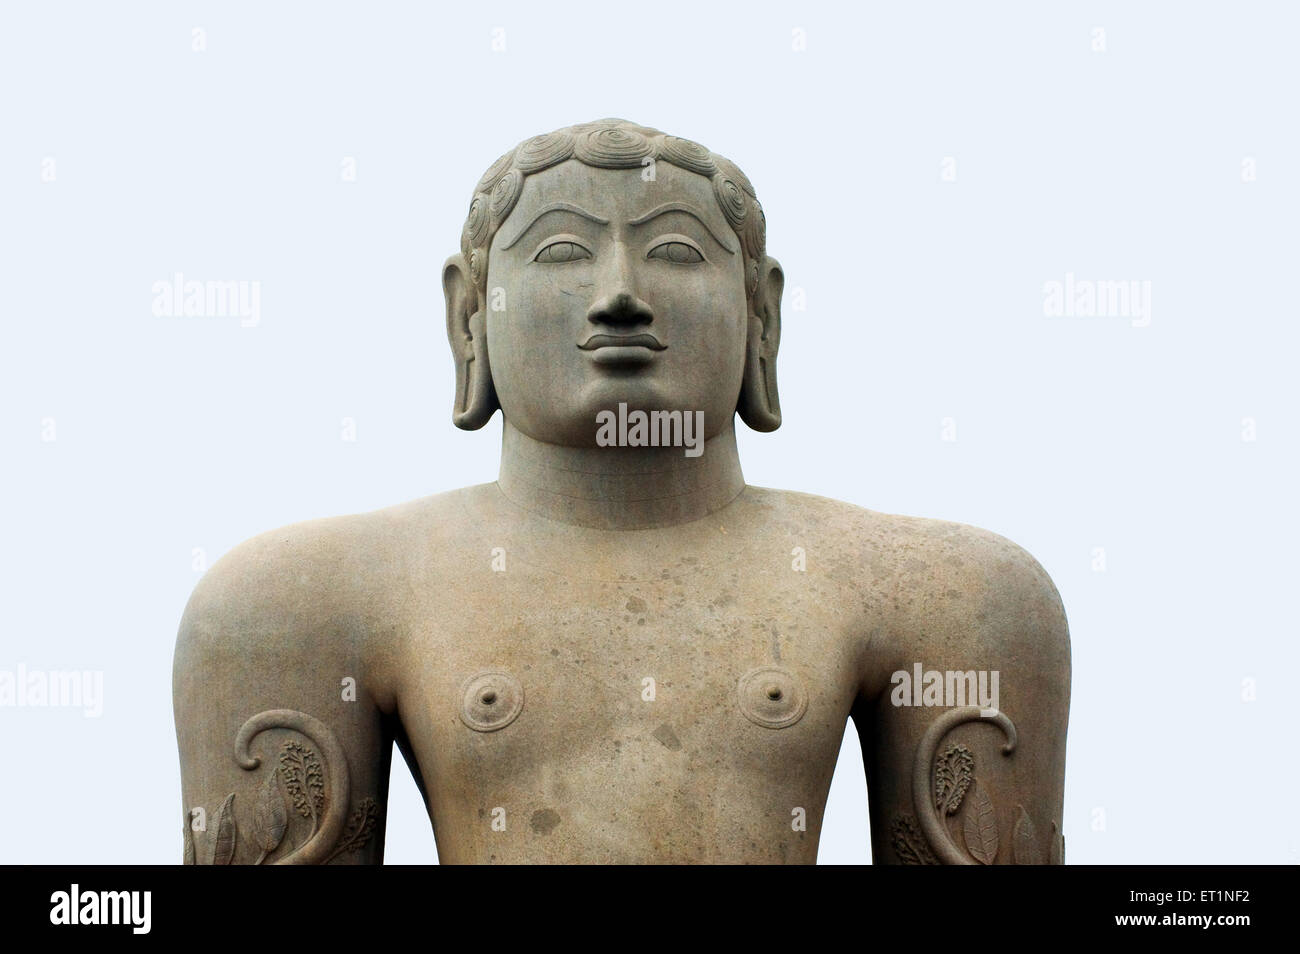 Statue of jain deity gomateshvara ; Sravanabelagola ; Hassan ; Karnataka ; India - Stock Image